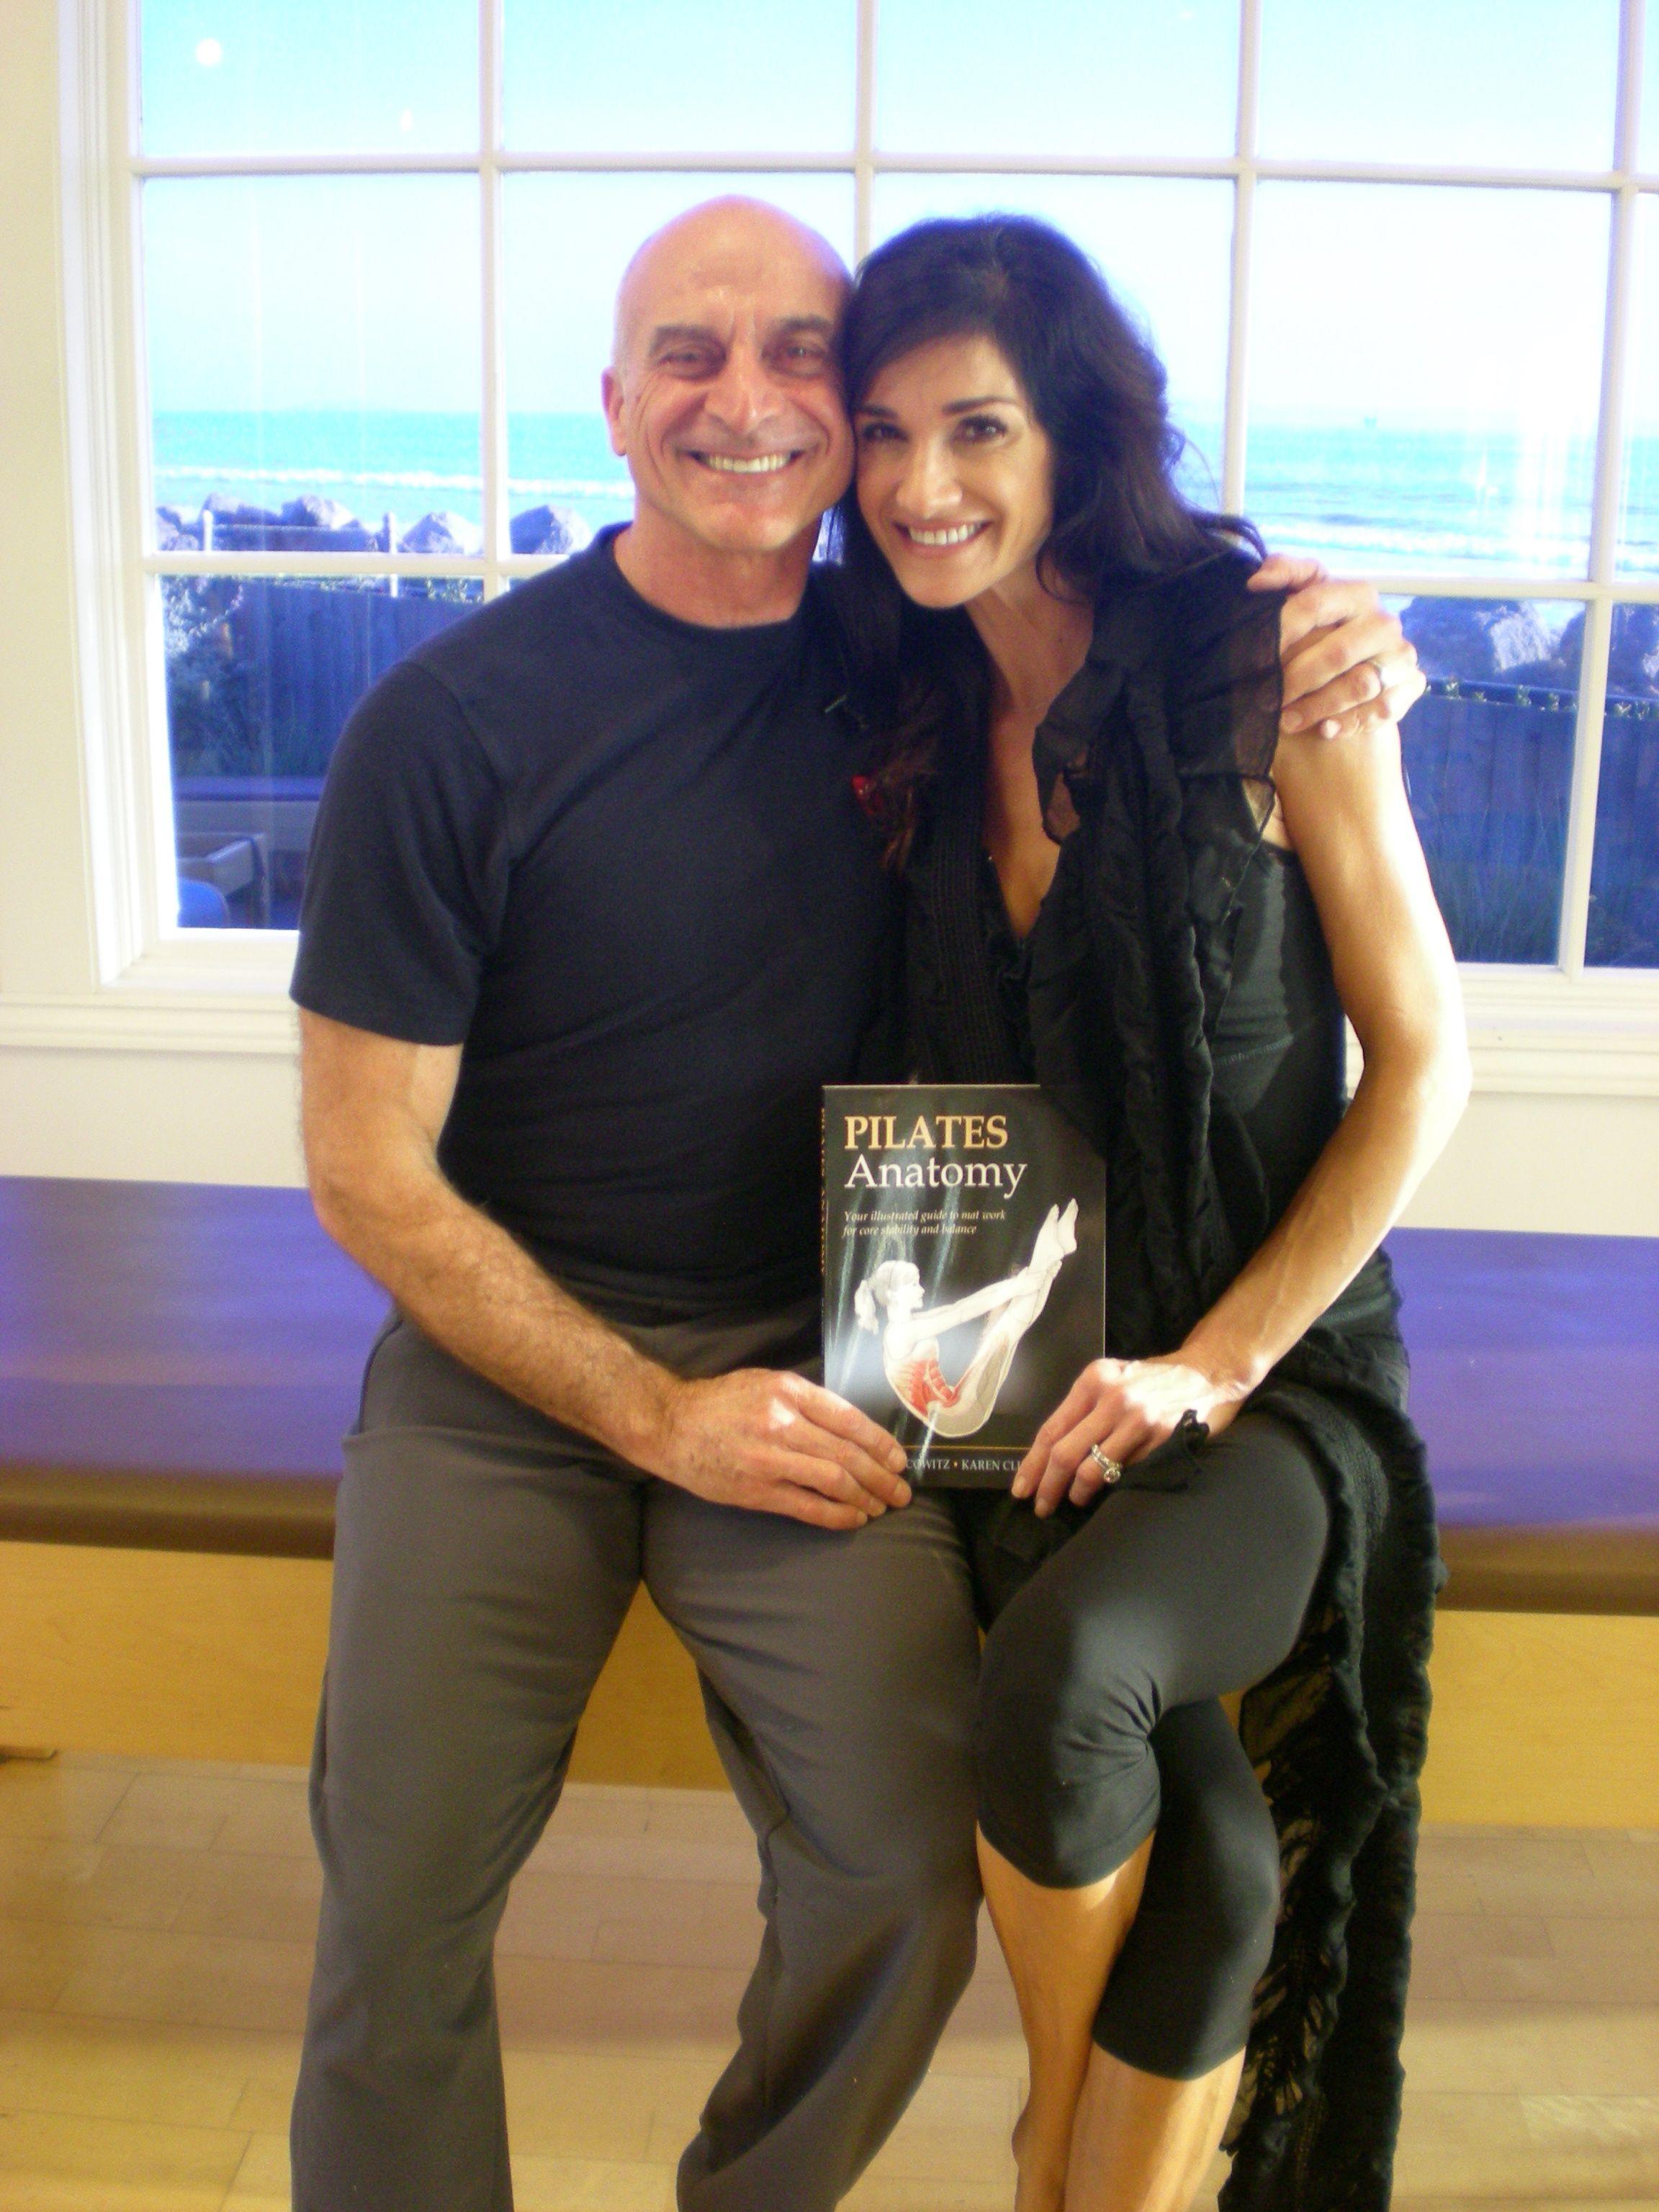 With my Mentor Rael Isacowitz. Pilates Anatomy textbook. | Rhythm ...